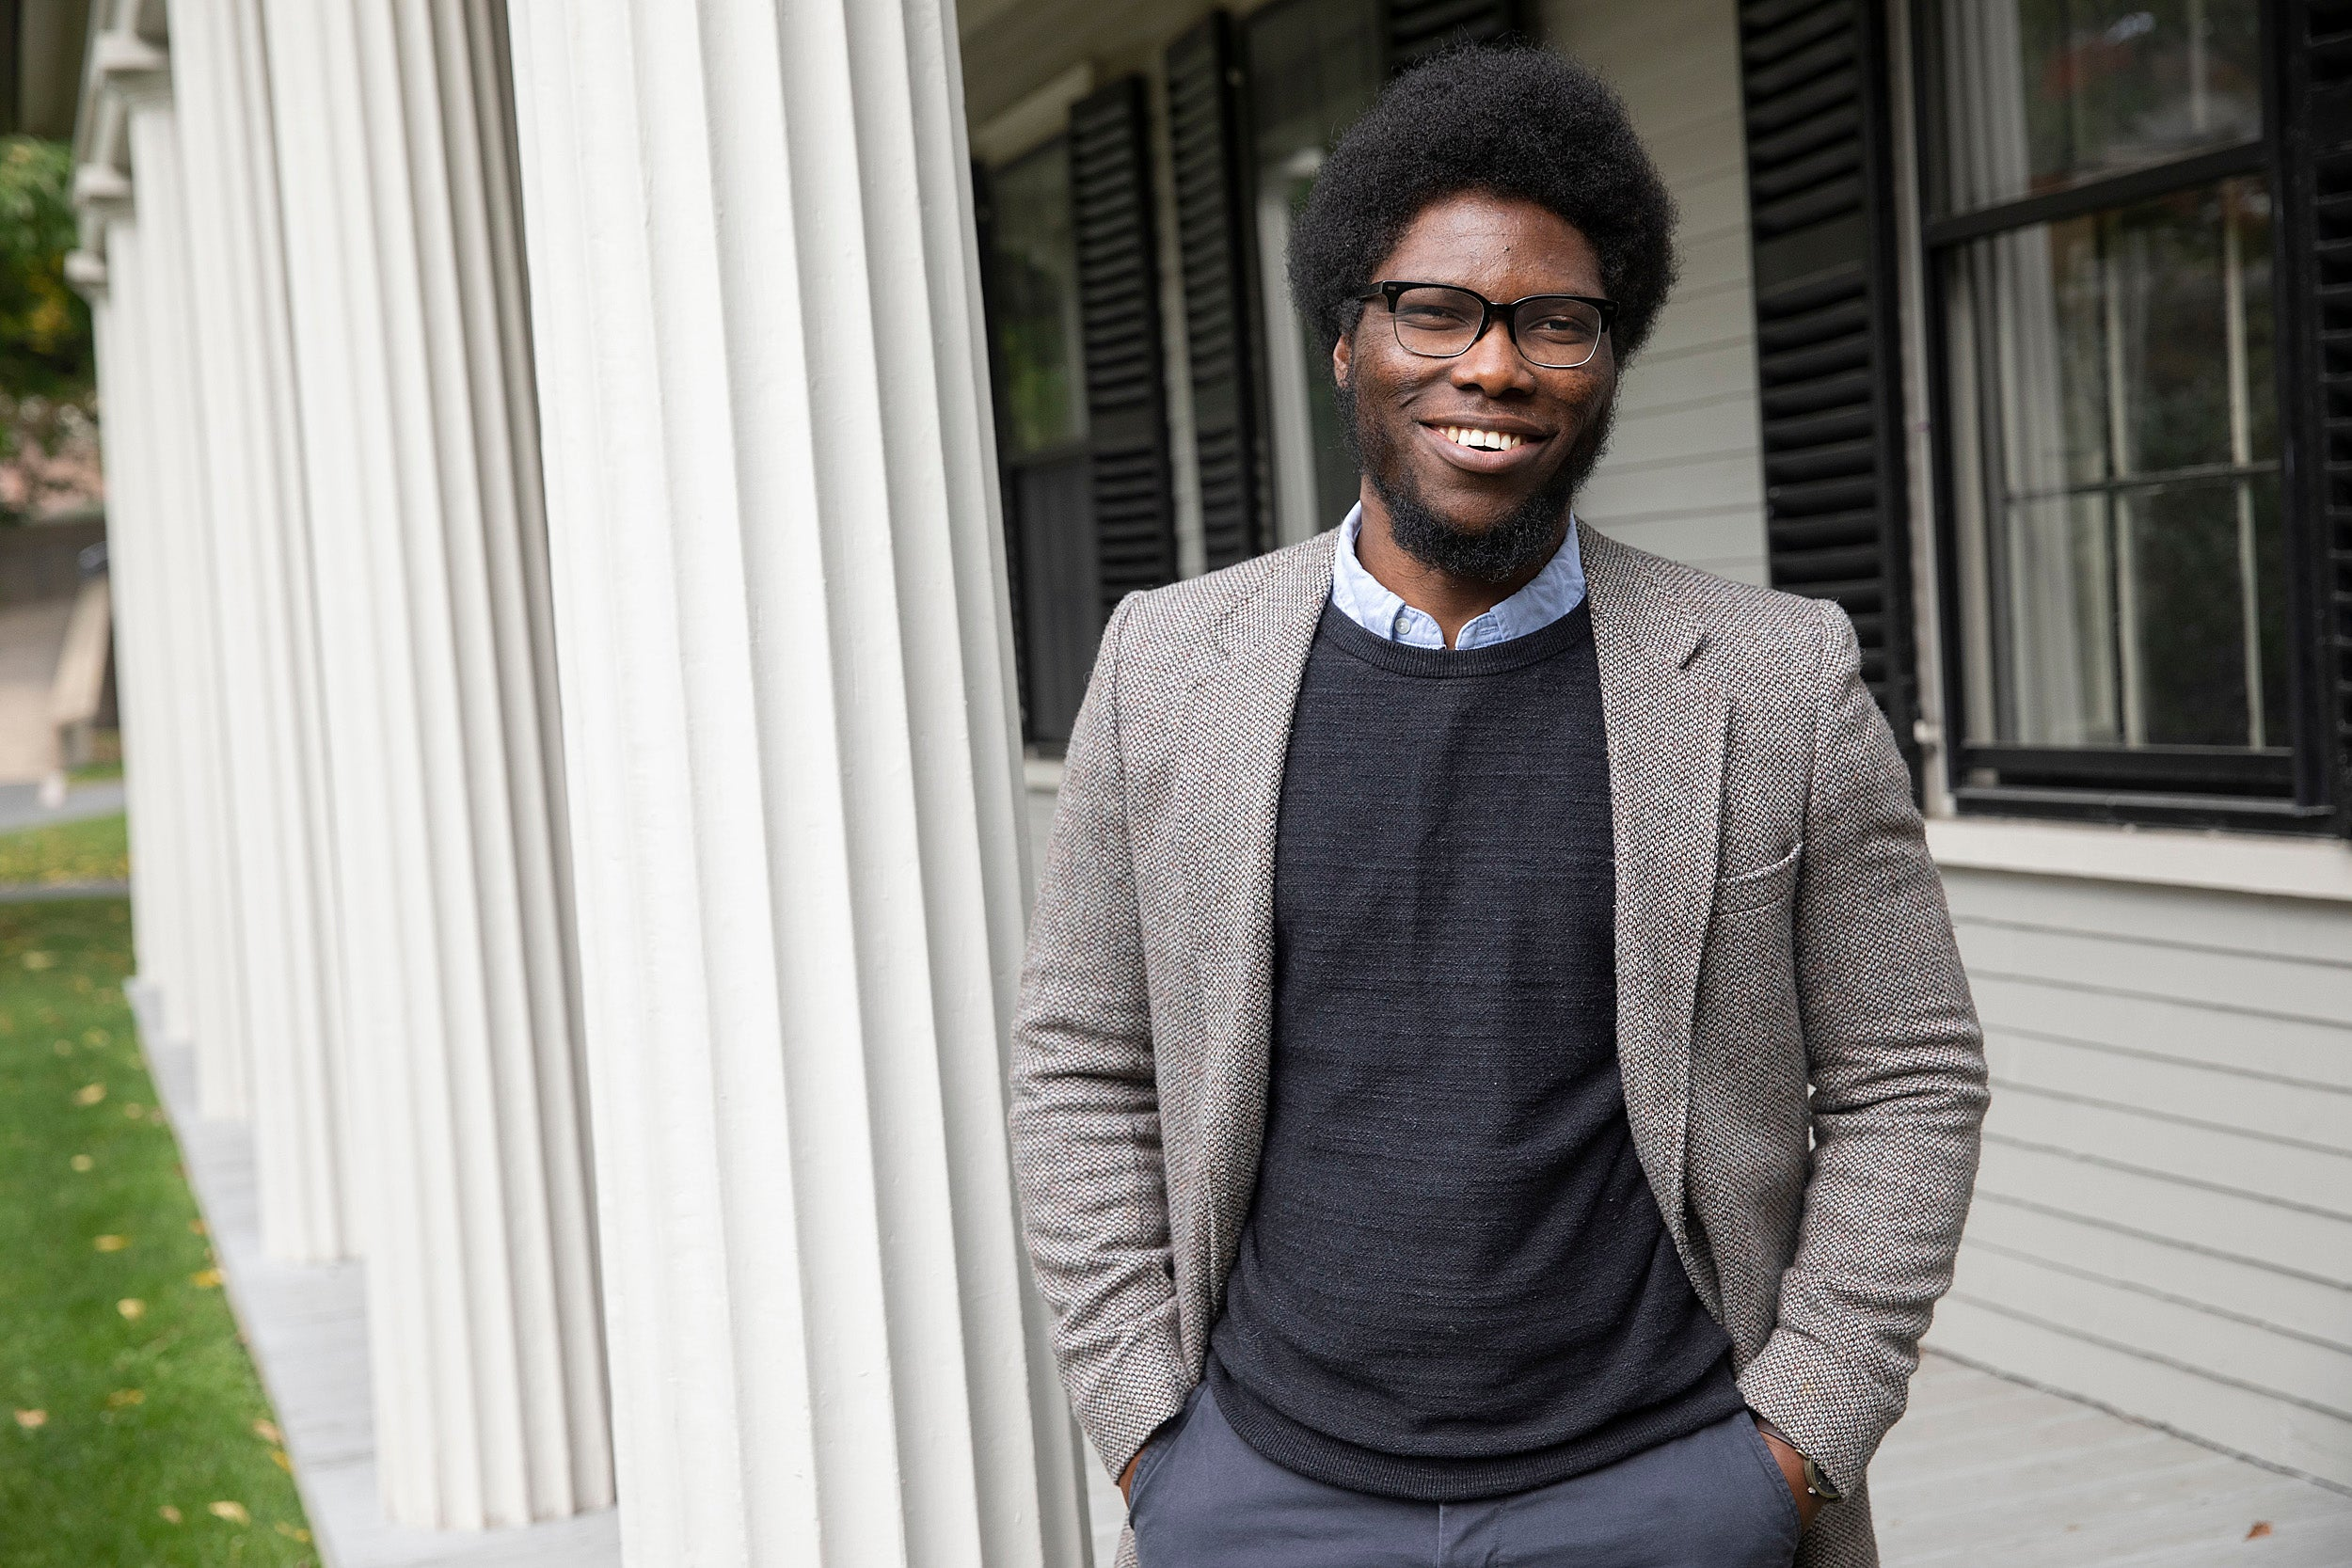 Daniel Agbiboa studies power through the lens of mobility